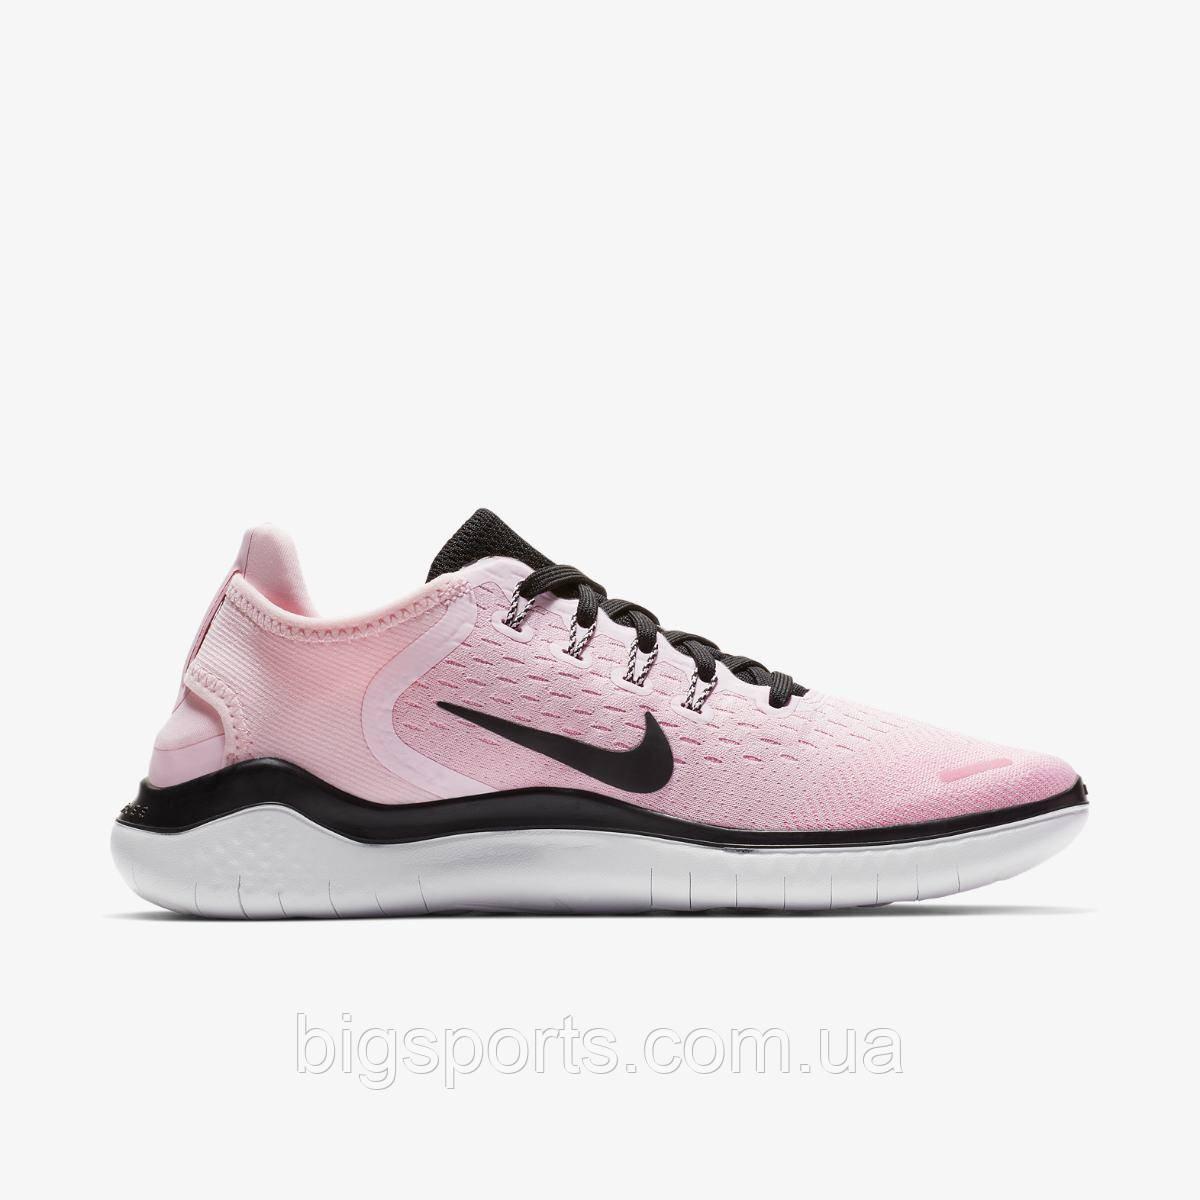 Кроссовки жен. Nike Wmns Free Rn 2018 (арт. 942837-603), фото 1